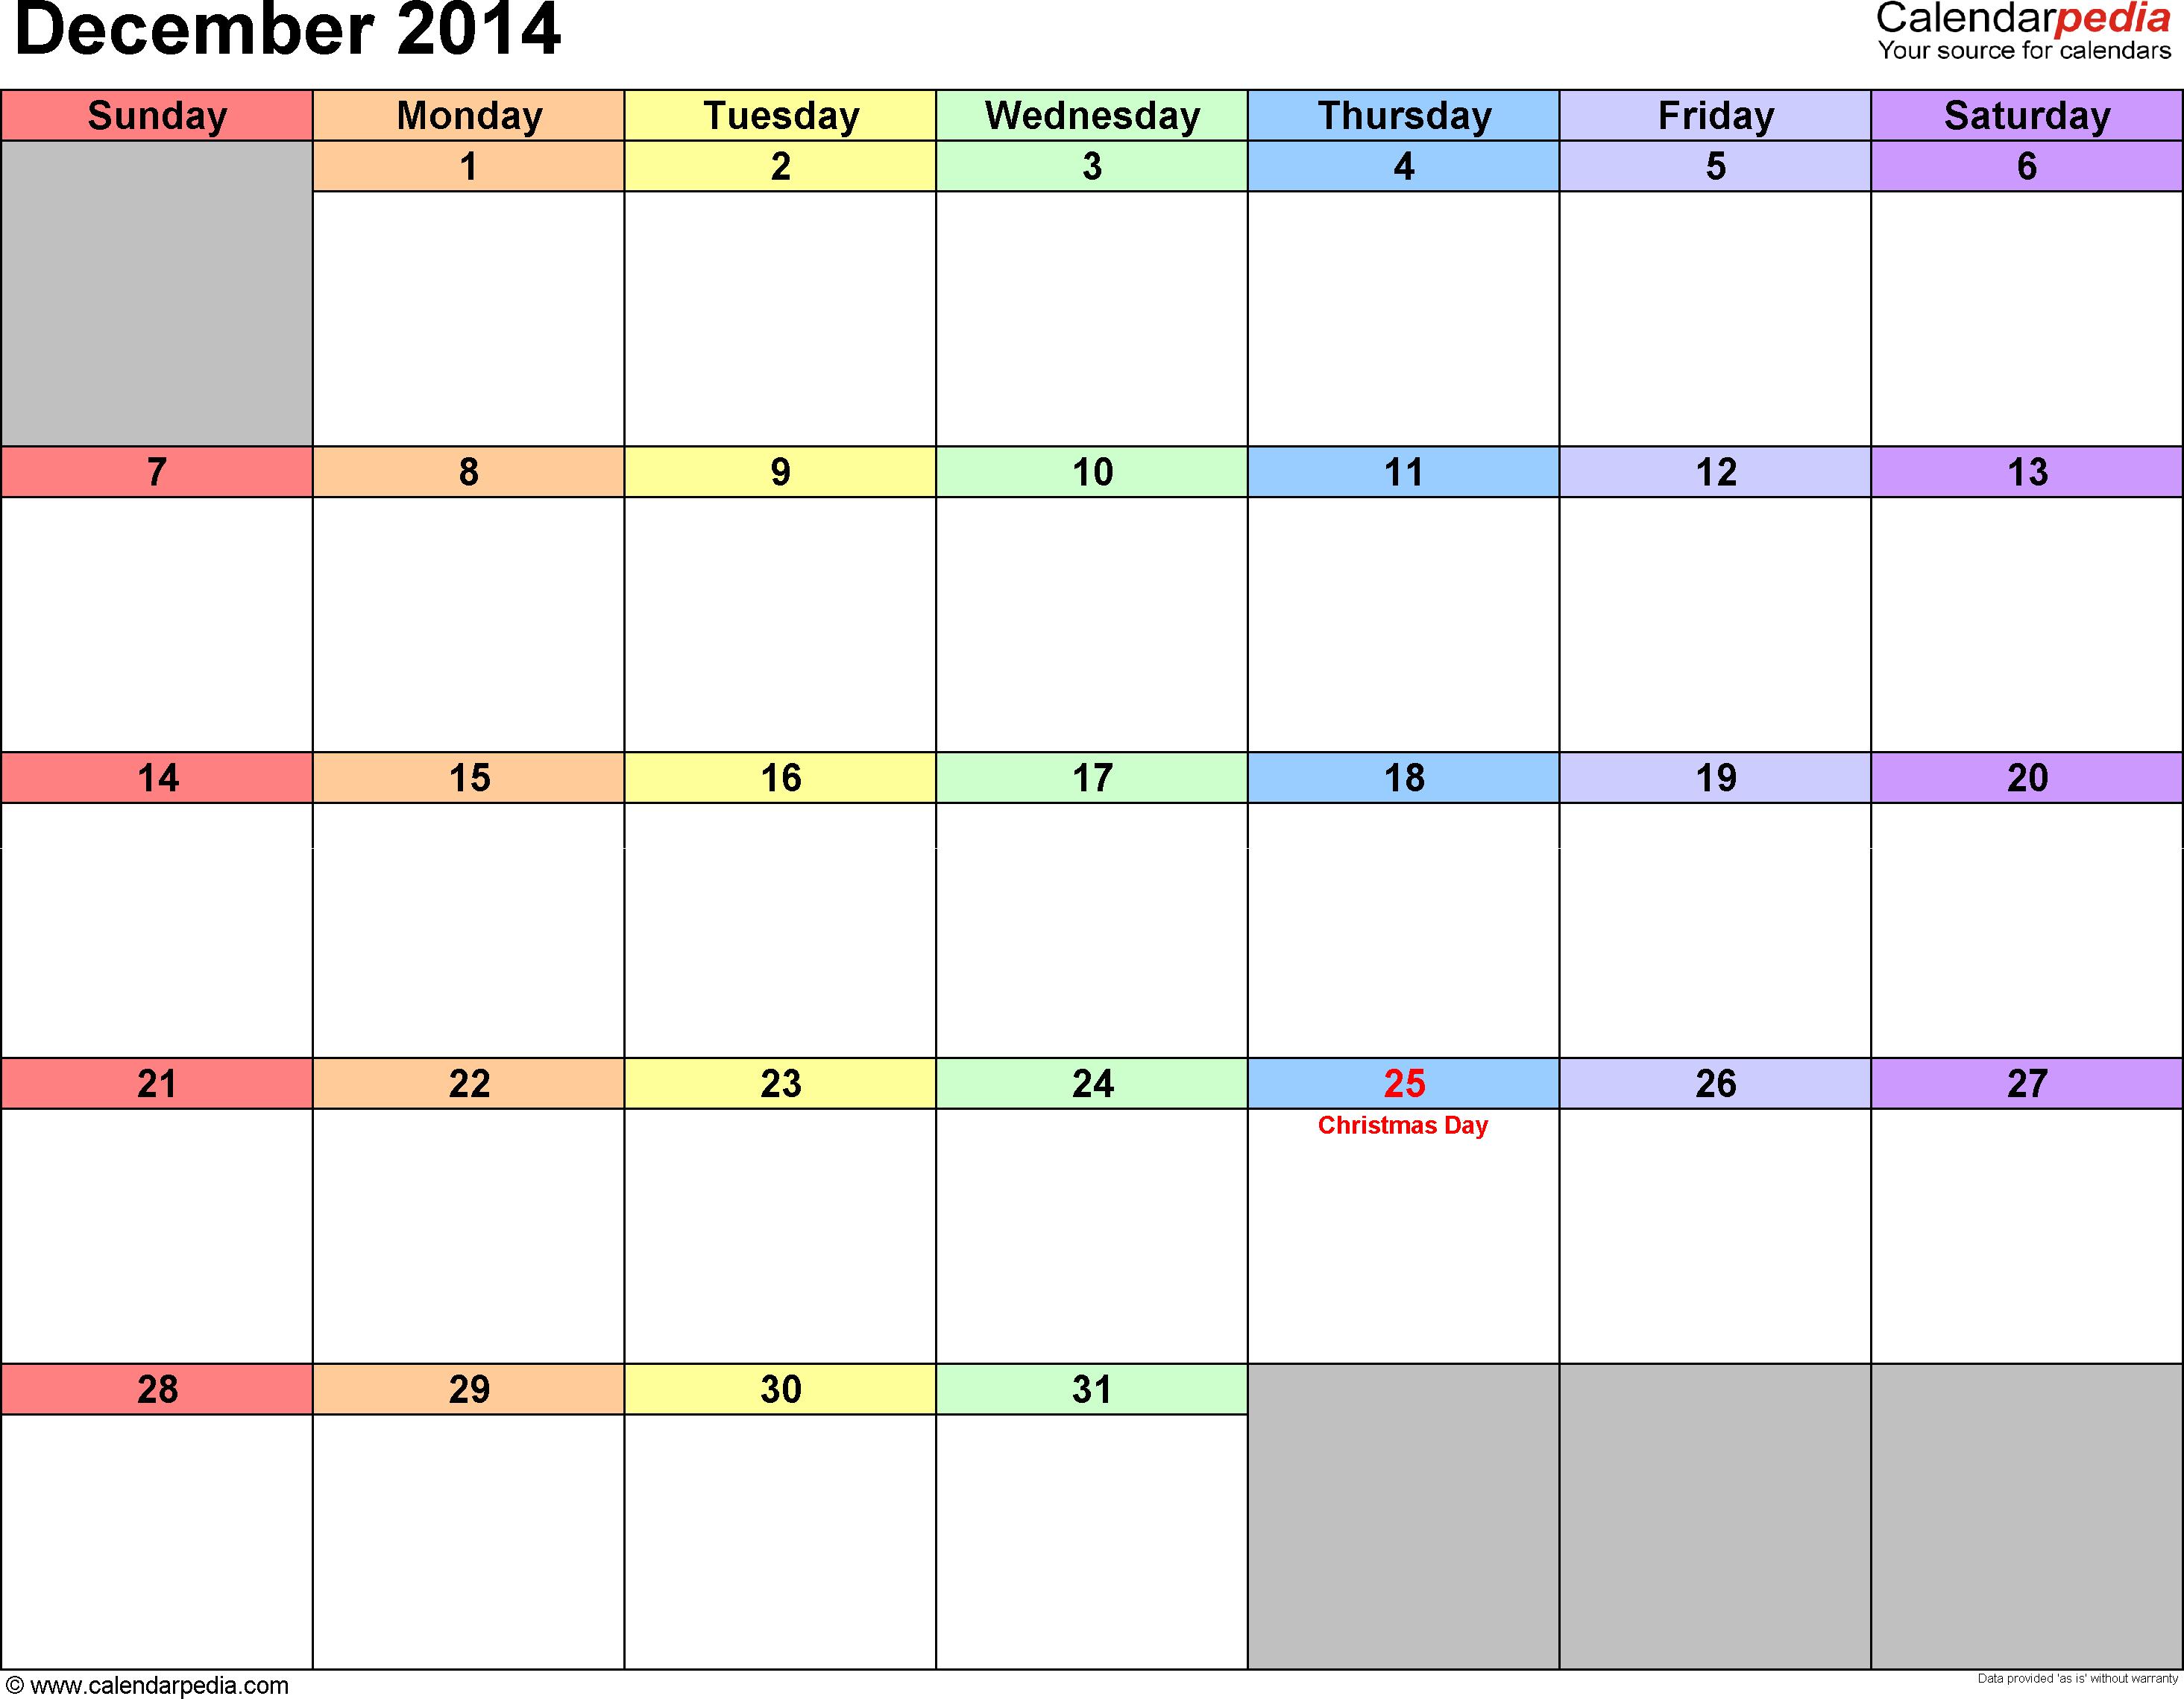 December 2014 calendar printable template